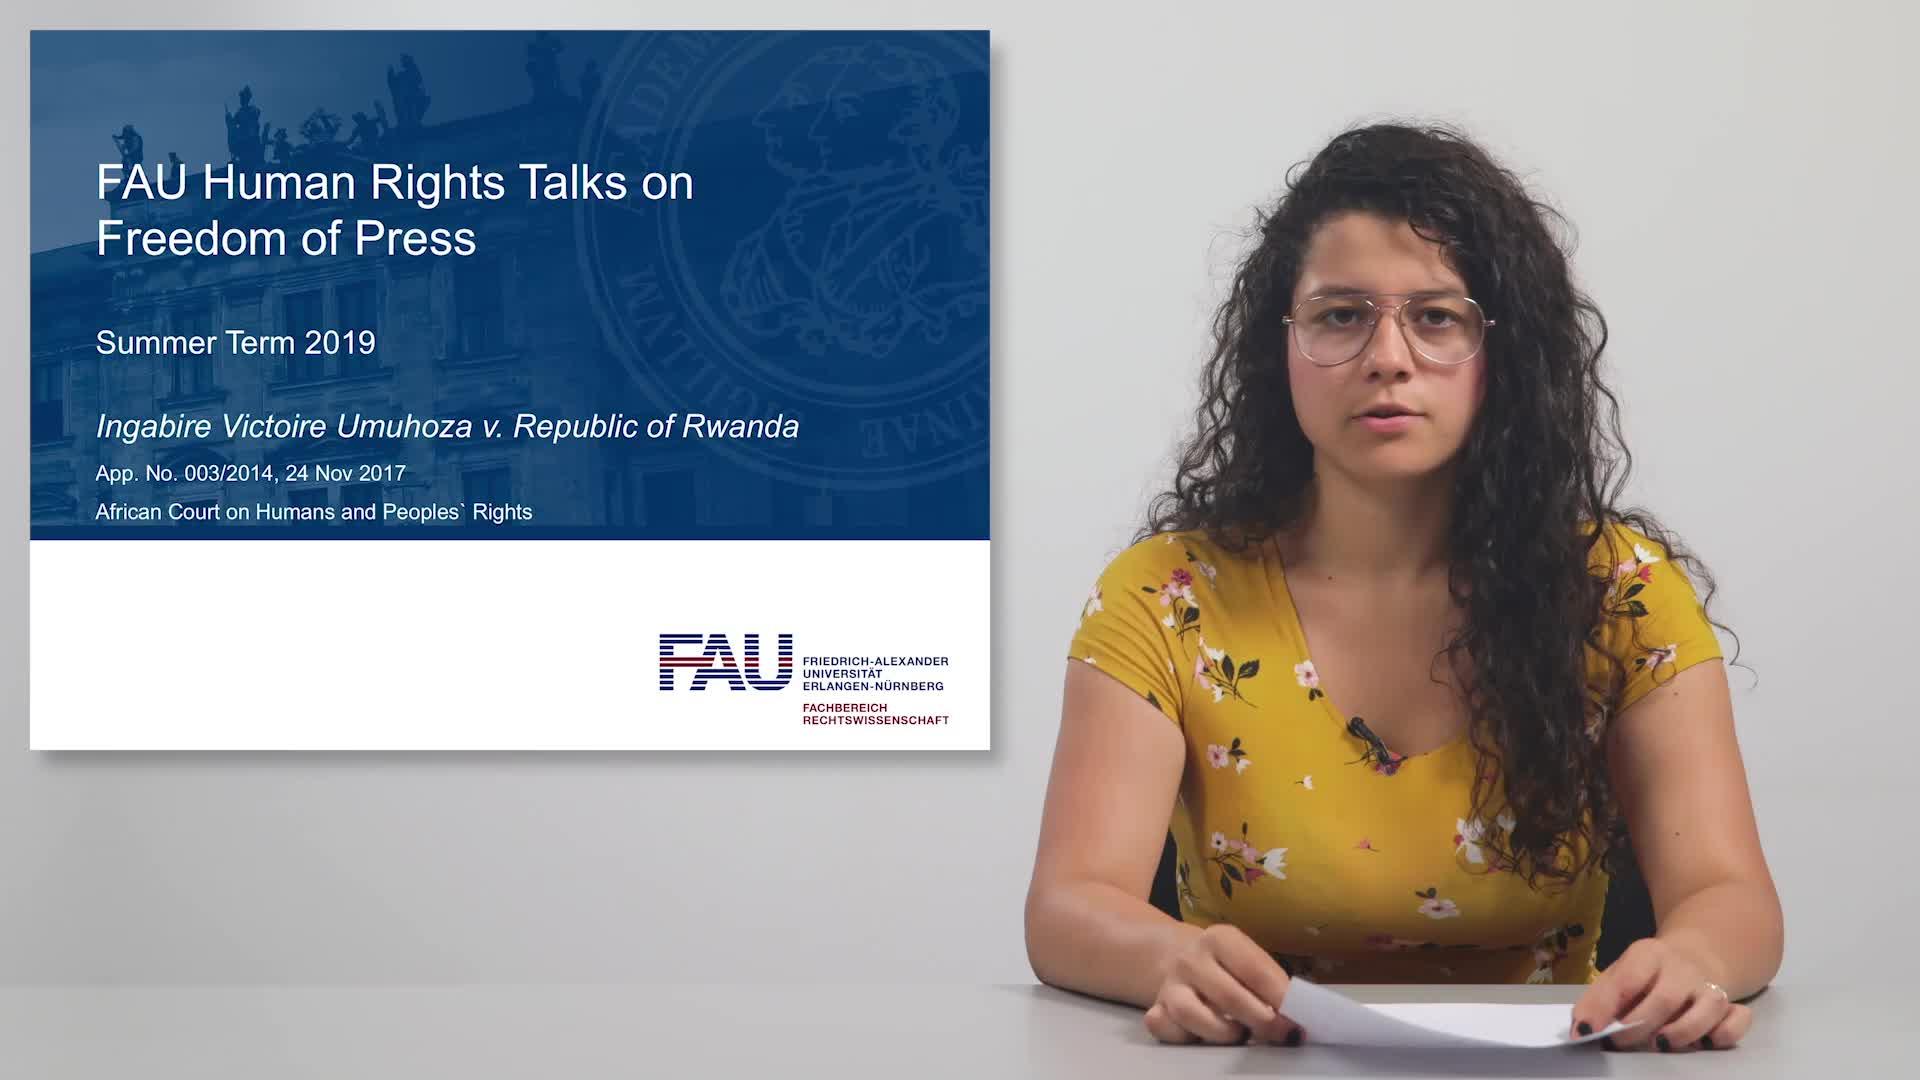 FAU Human Rights Talks – Summer Term 2019: Ingabire Victoire Umuhoza v. Republic of Rwanda preview image